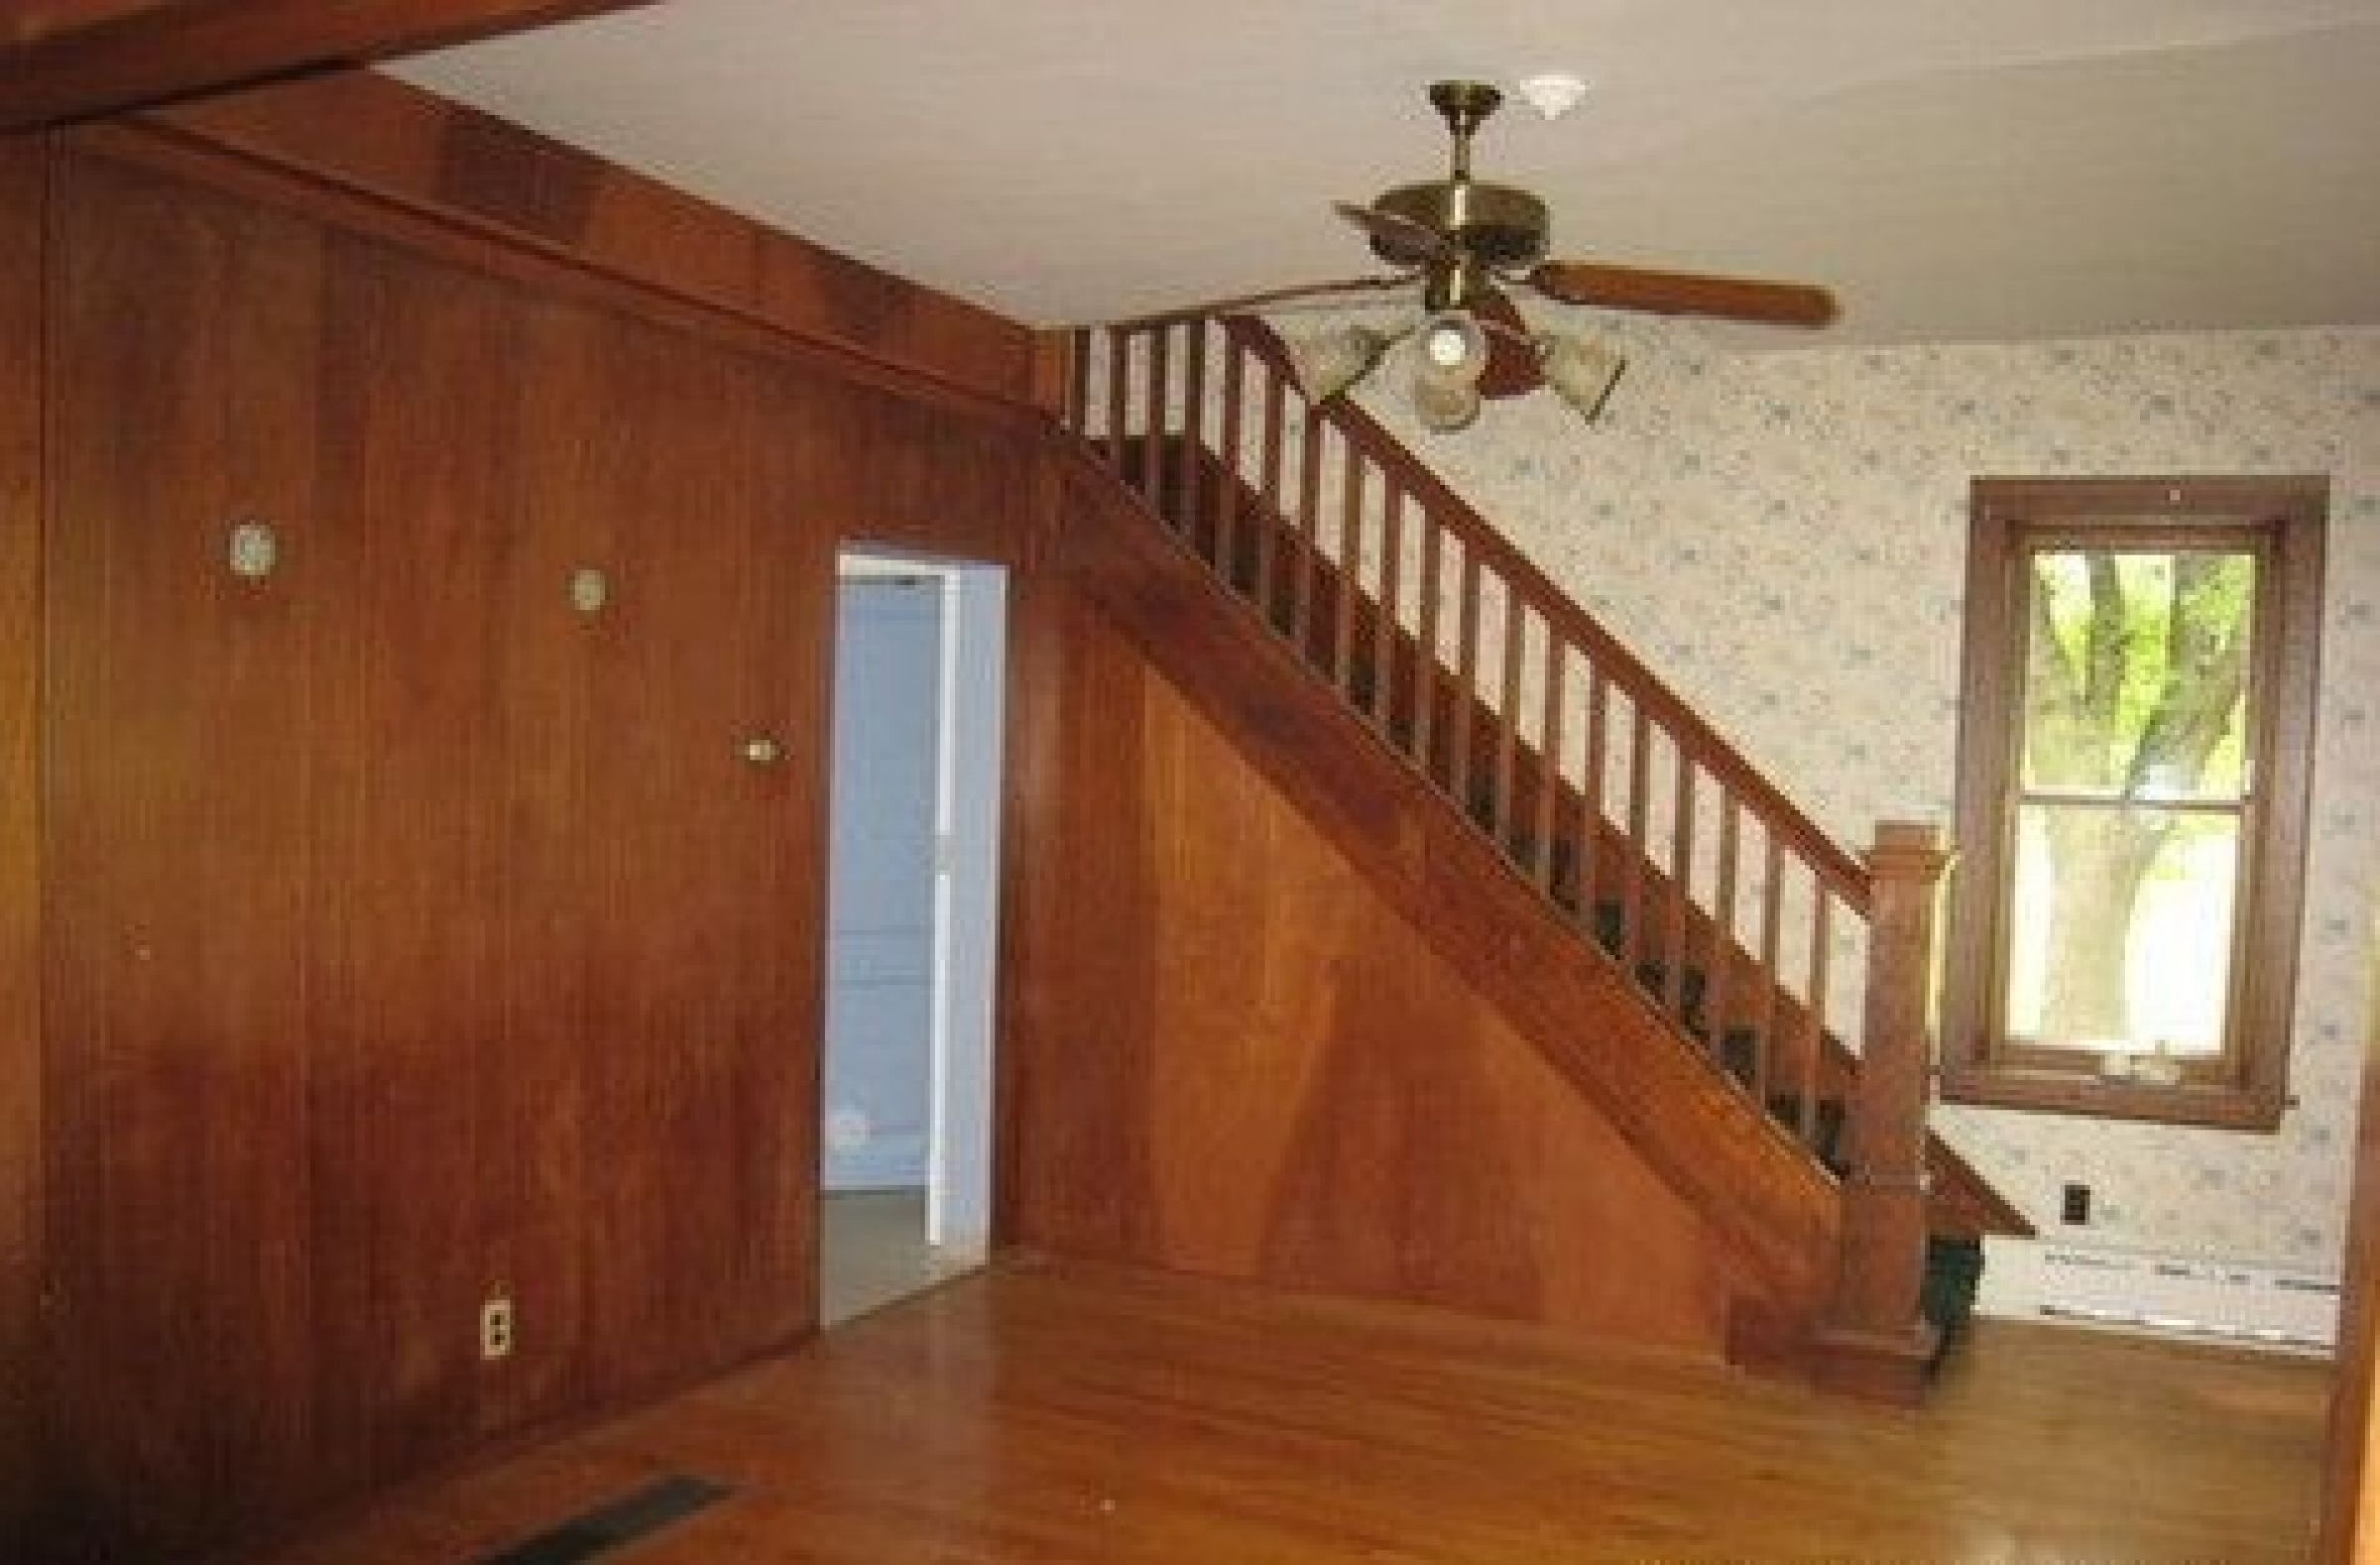 residential-land-mcleod-county-minnesota-80-acres-listing-number-15182-0-2020-09-23-170345.jpg